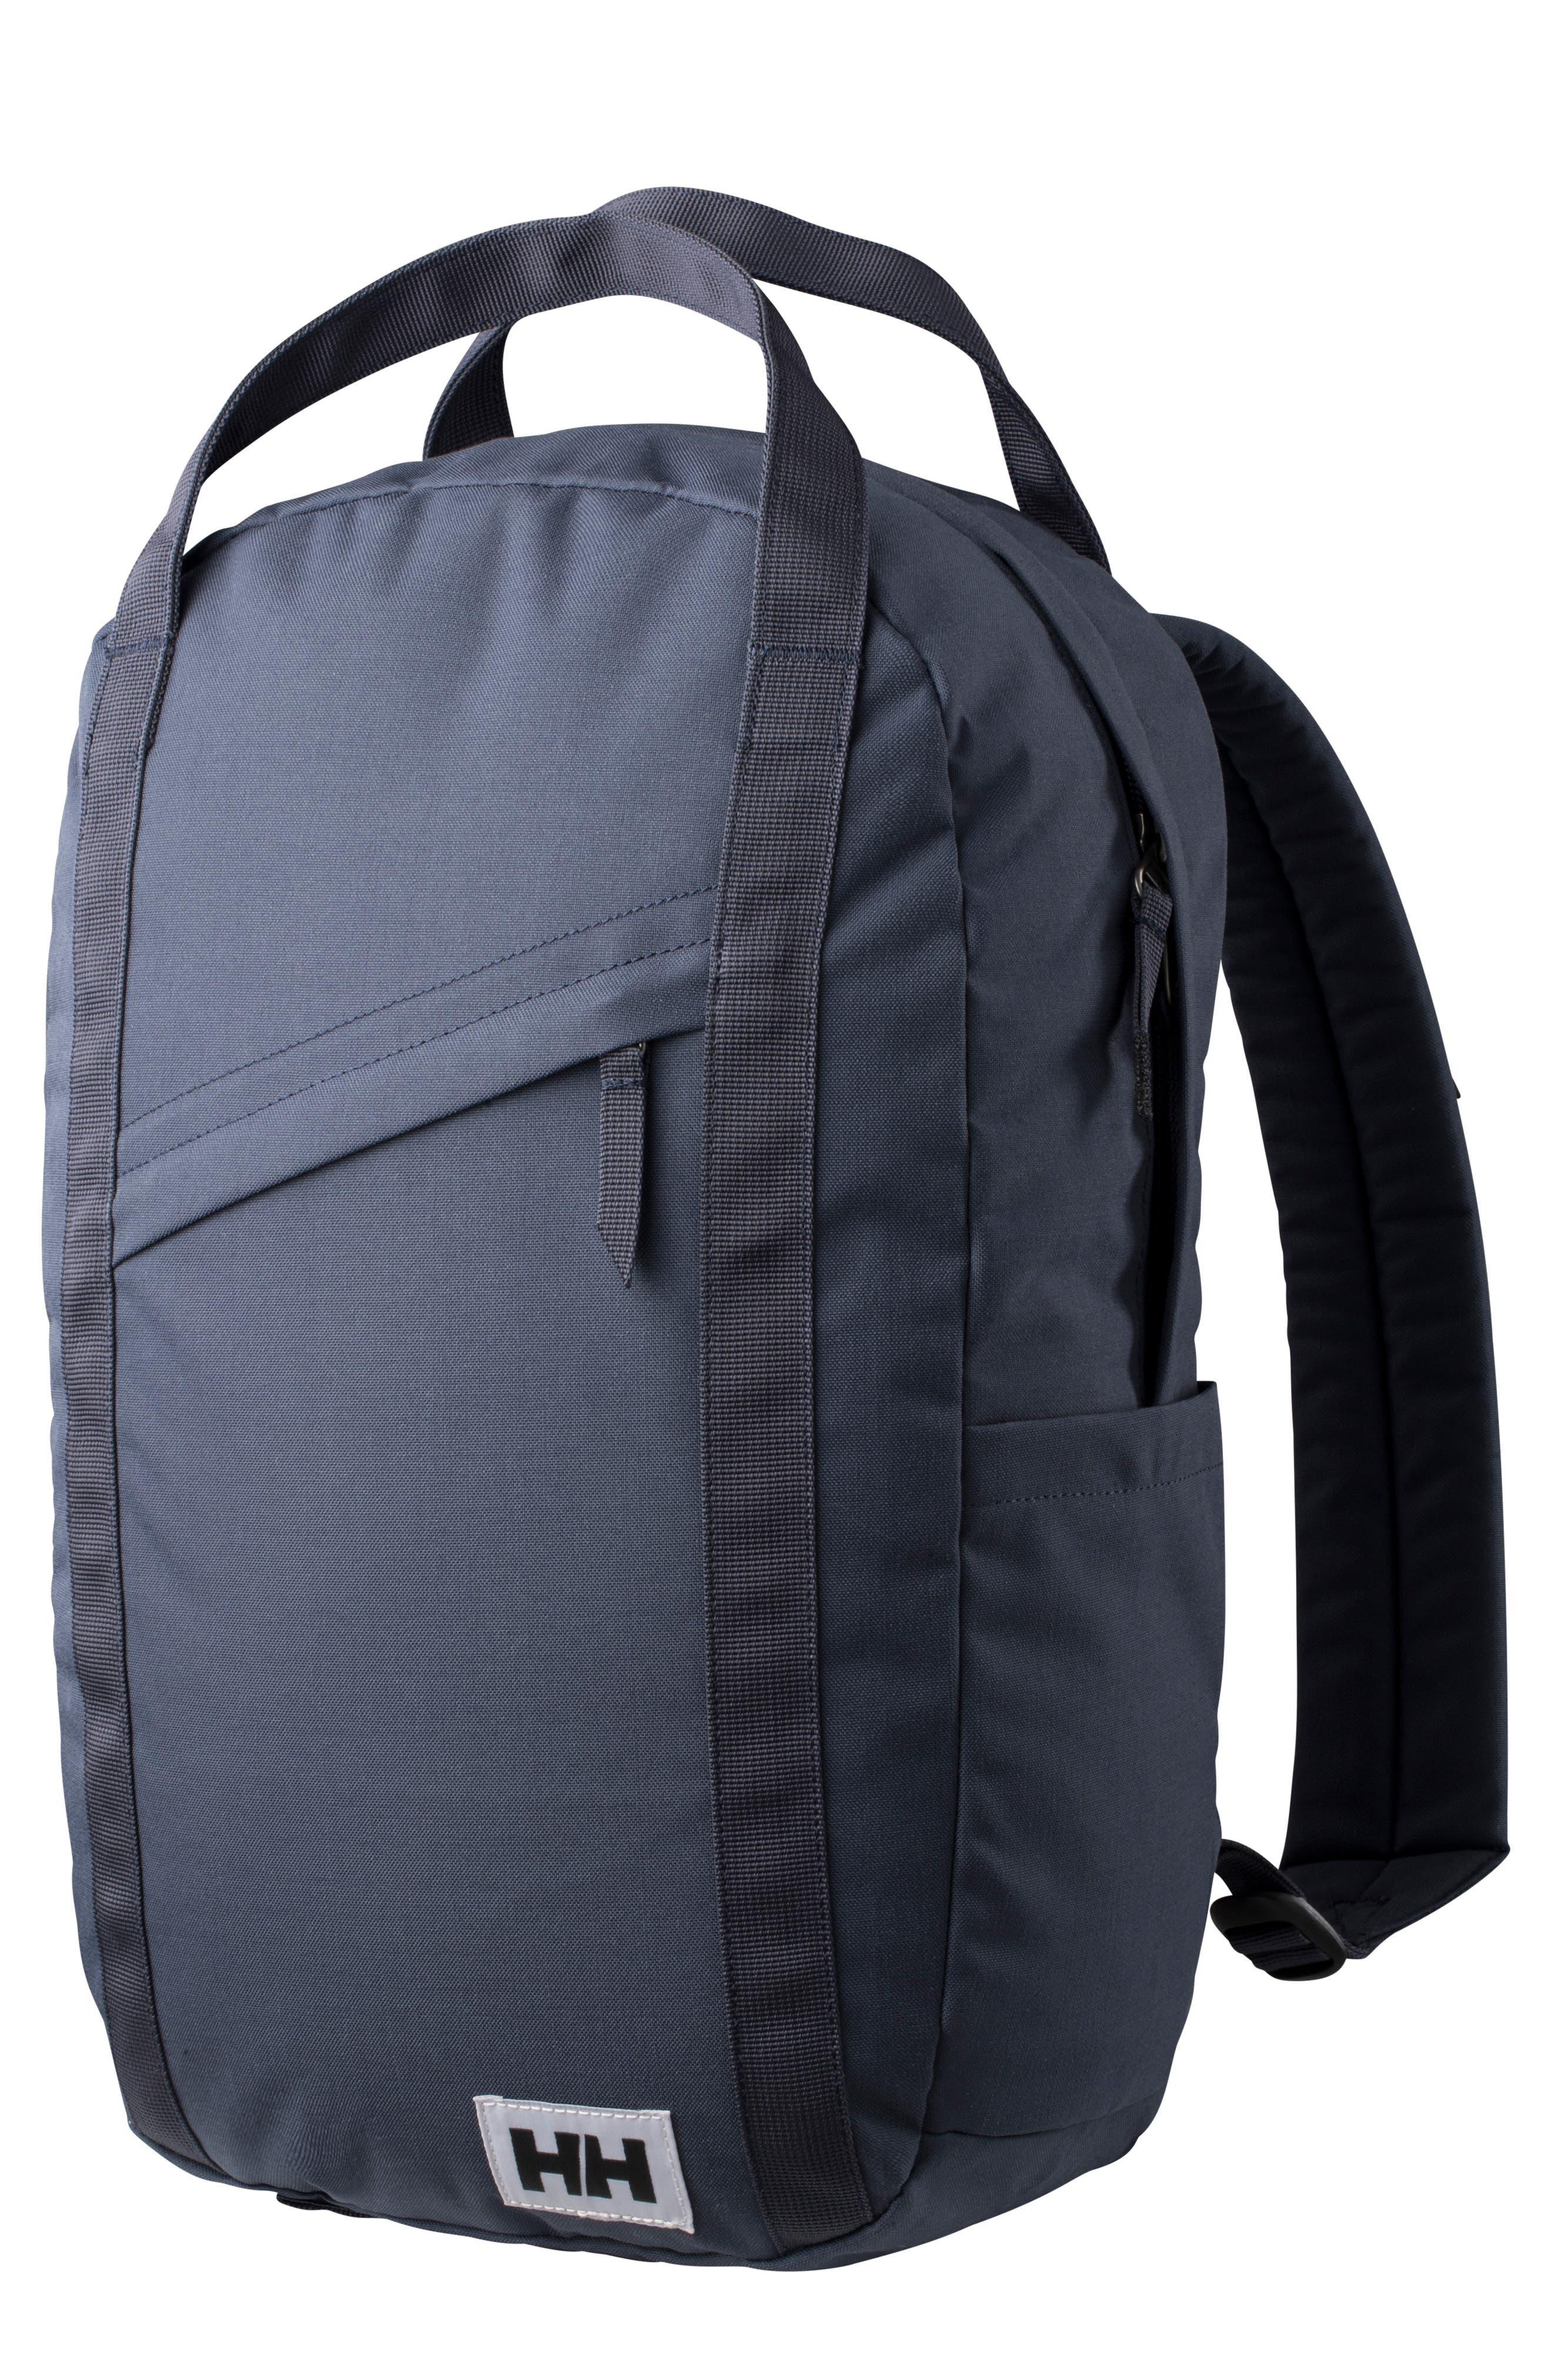 Oslo Backpack,                             Main thumbnail 1, color,                             GRAPHITE BLUE